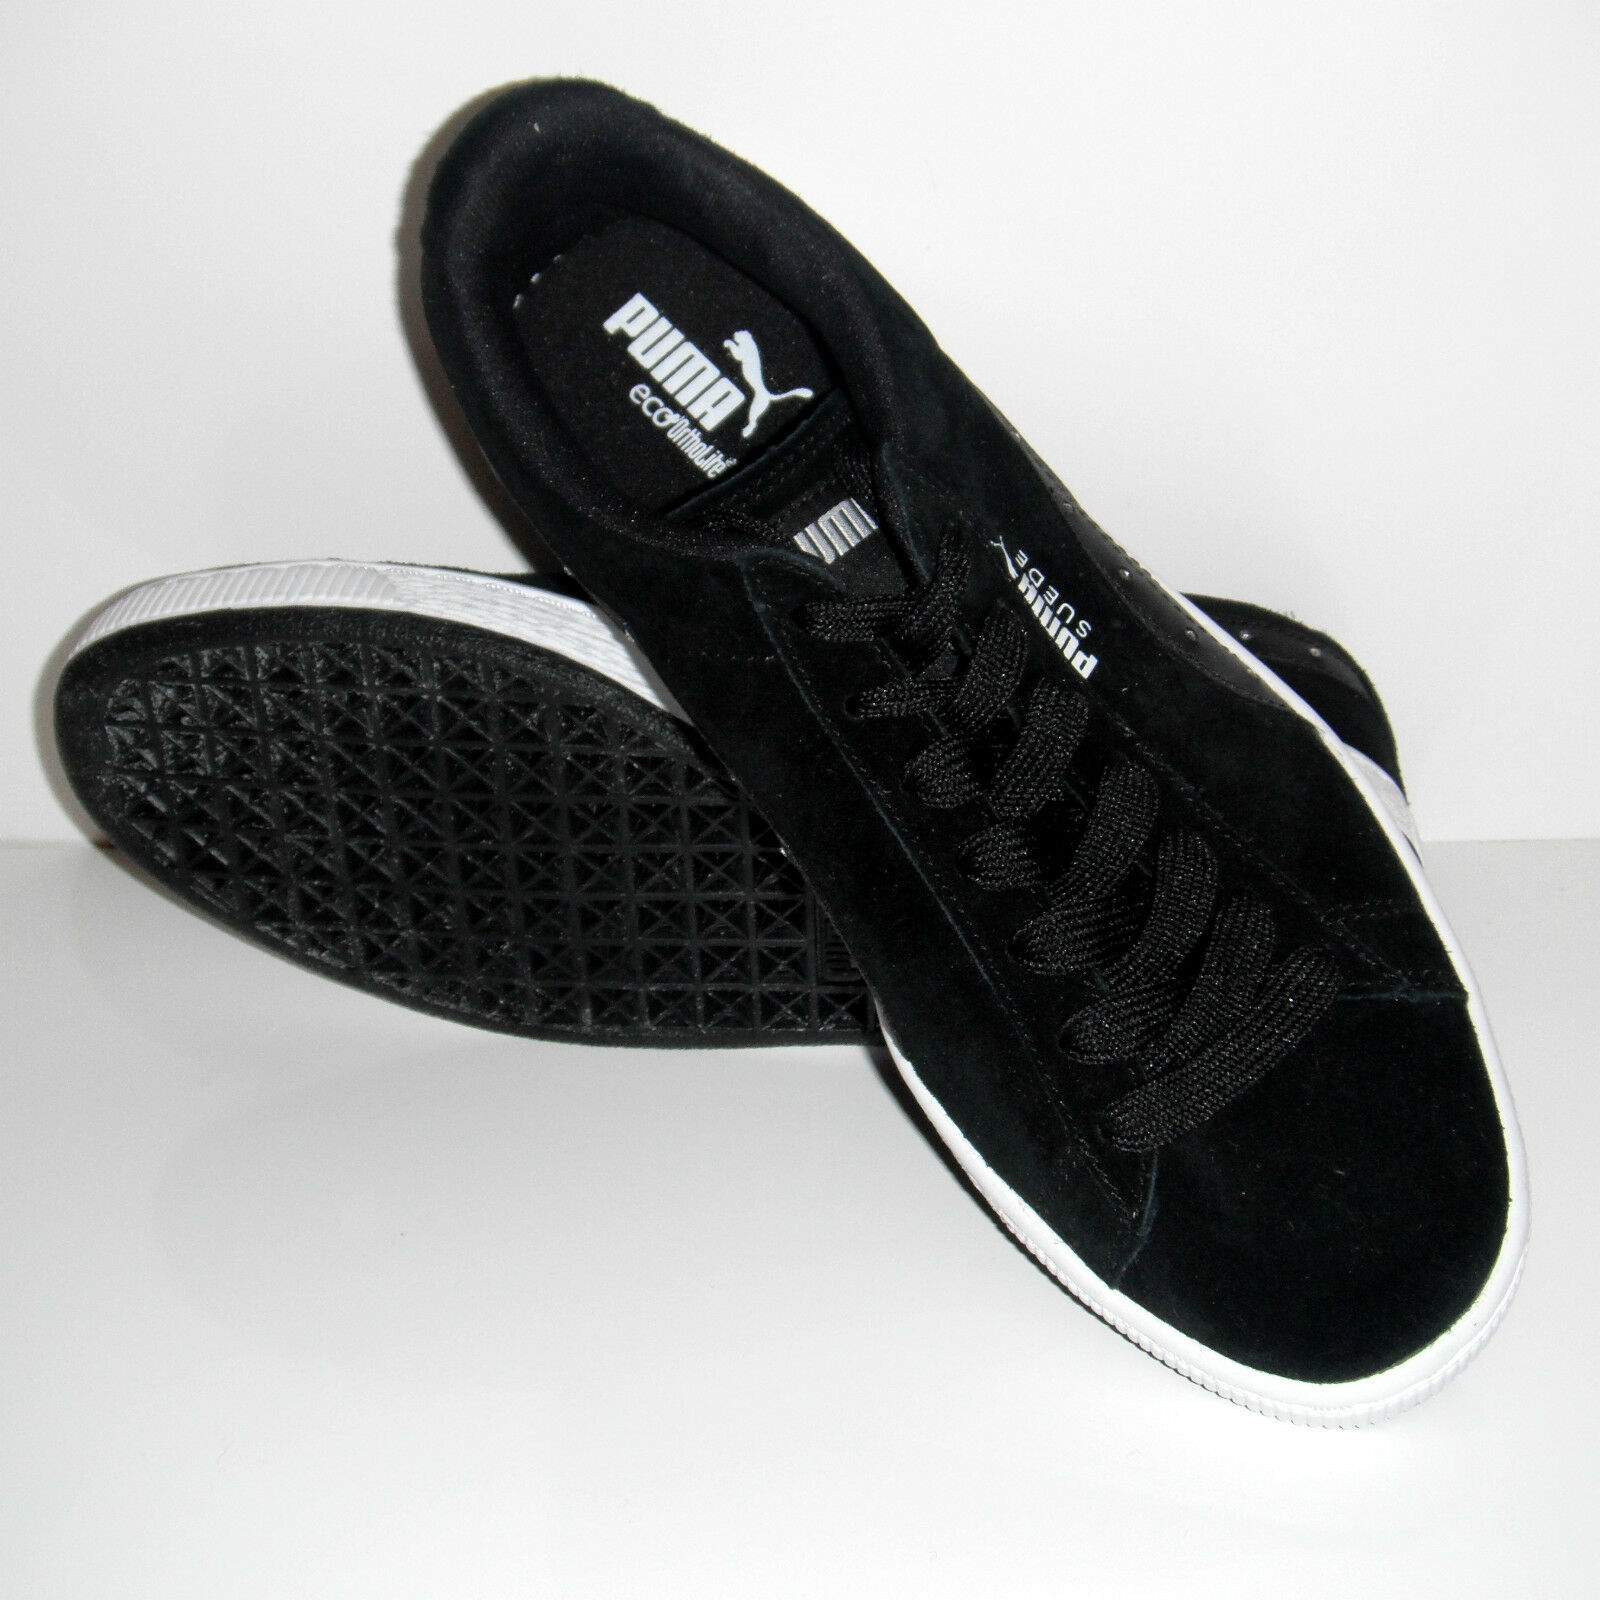 New Puma Men Eco Ortholite Black Suede Studded Sport Sneakers shoes sz 8.5M